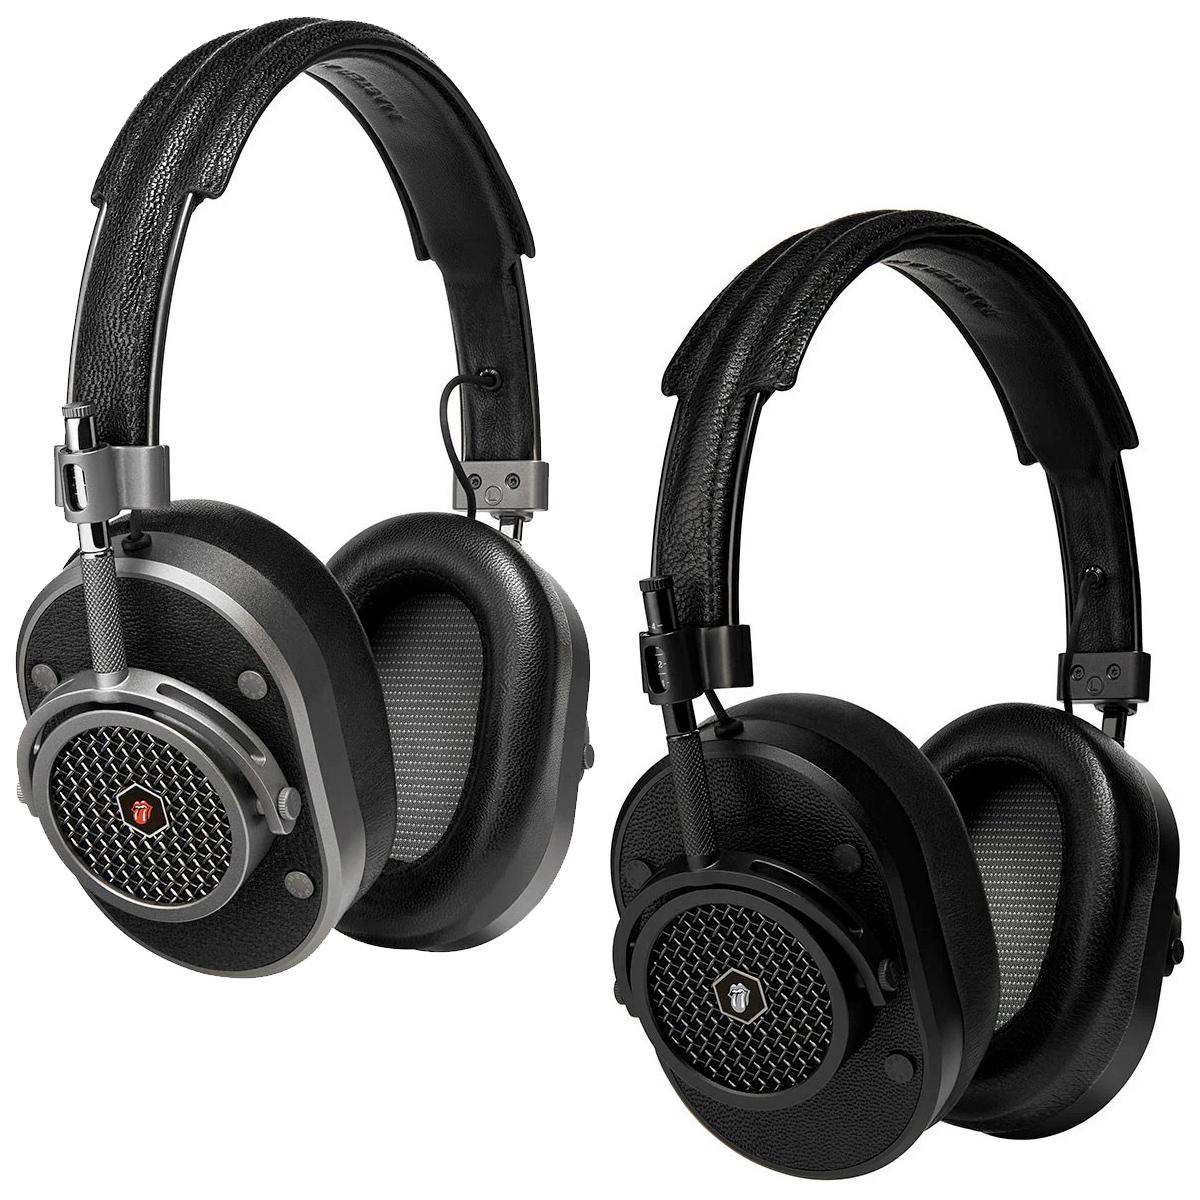 Rolling Stones MH40 Master & Dynamic Headphones